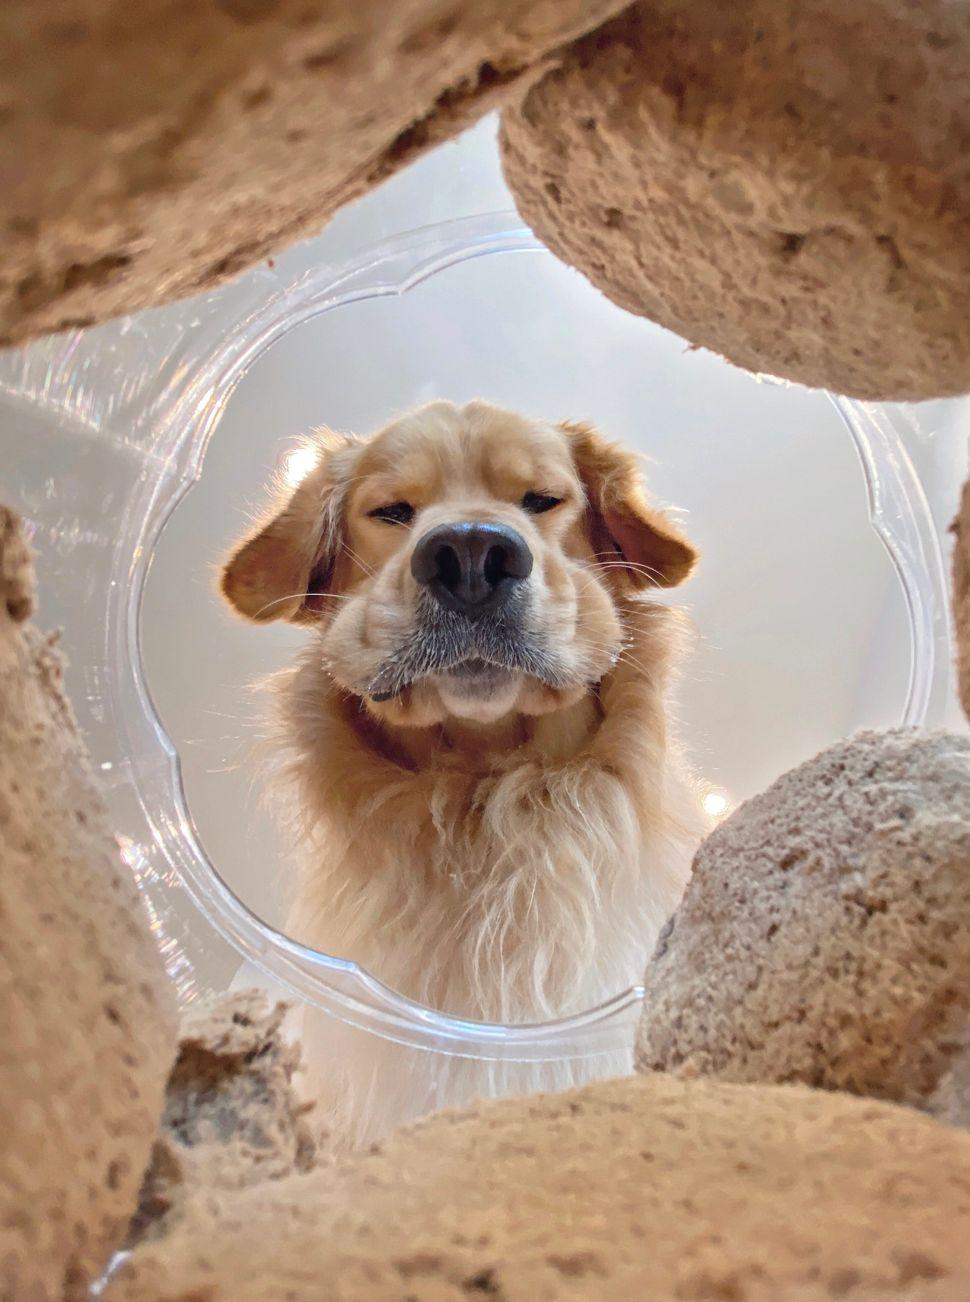 Mars Petcare Comedy Pet Photo Awards